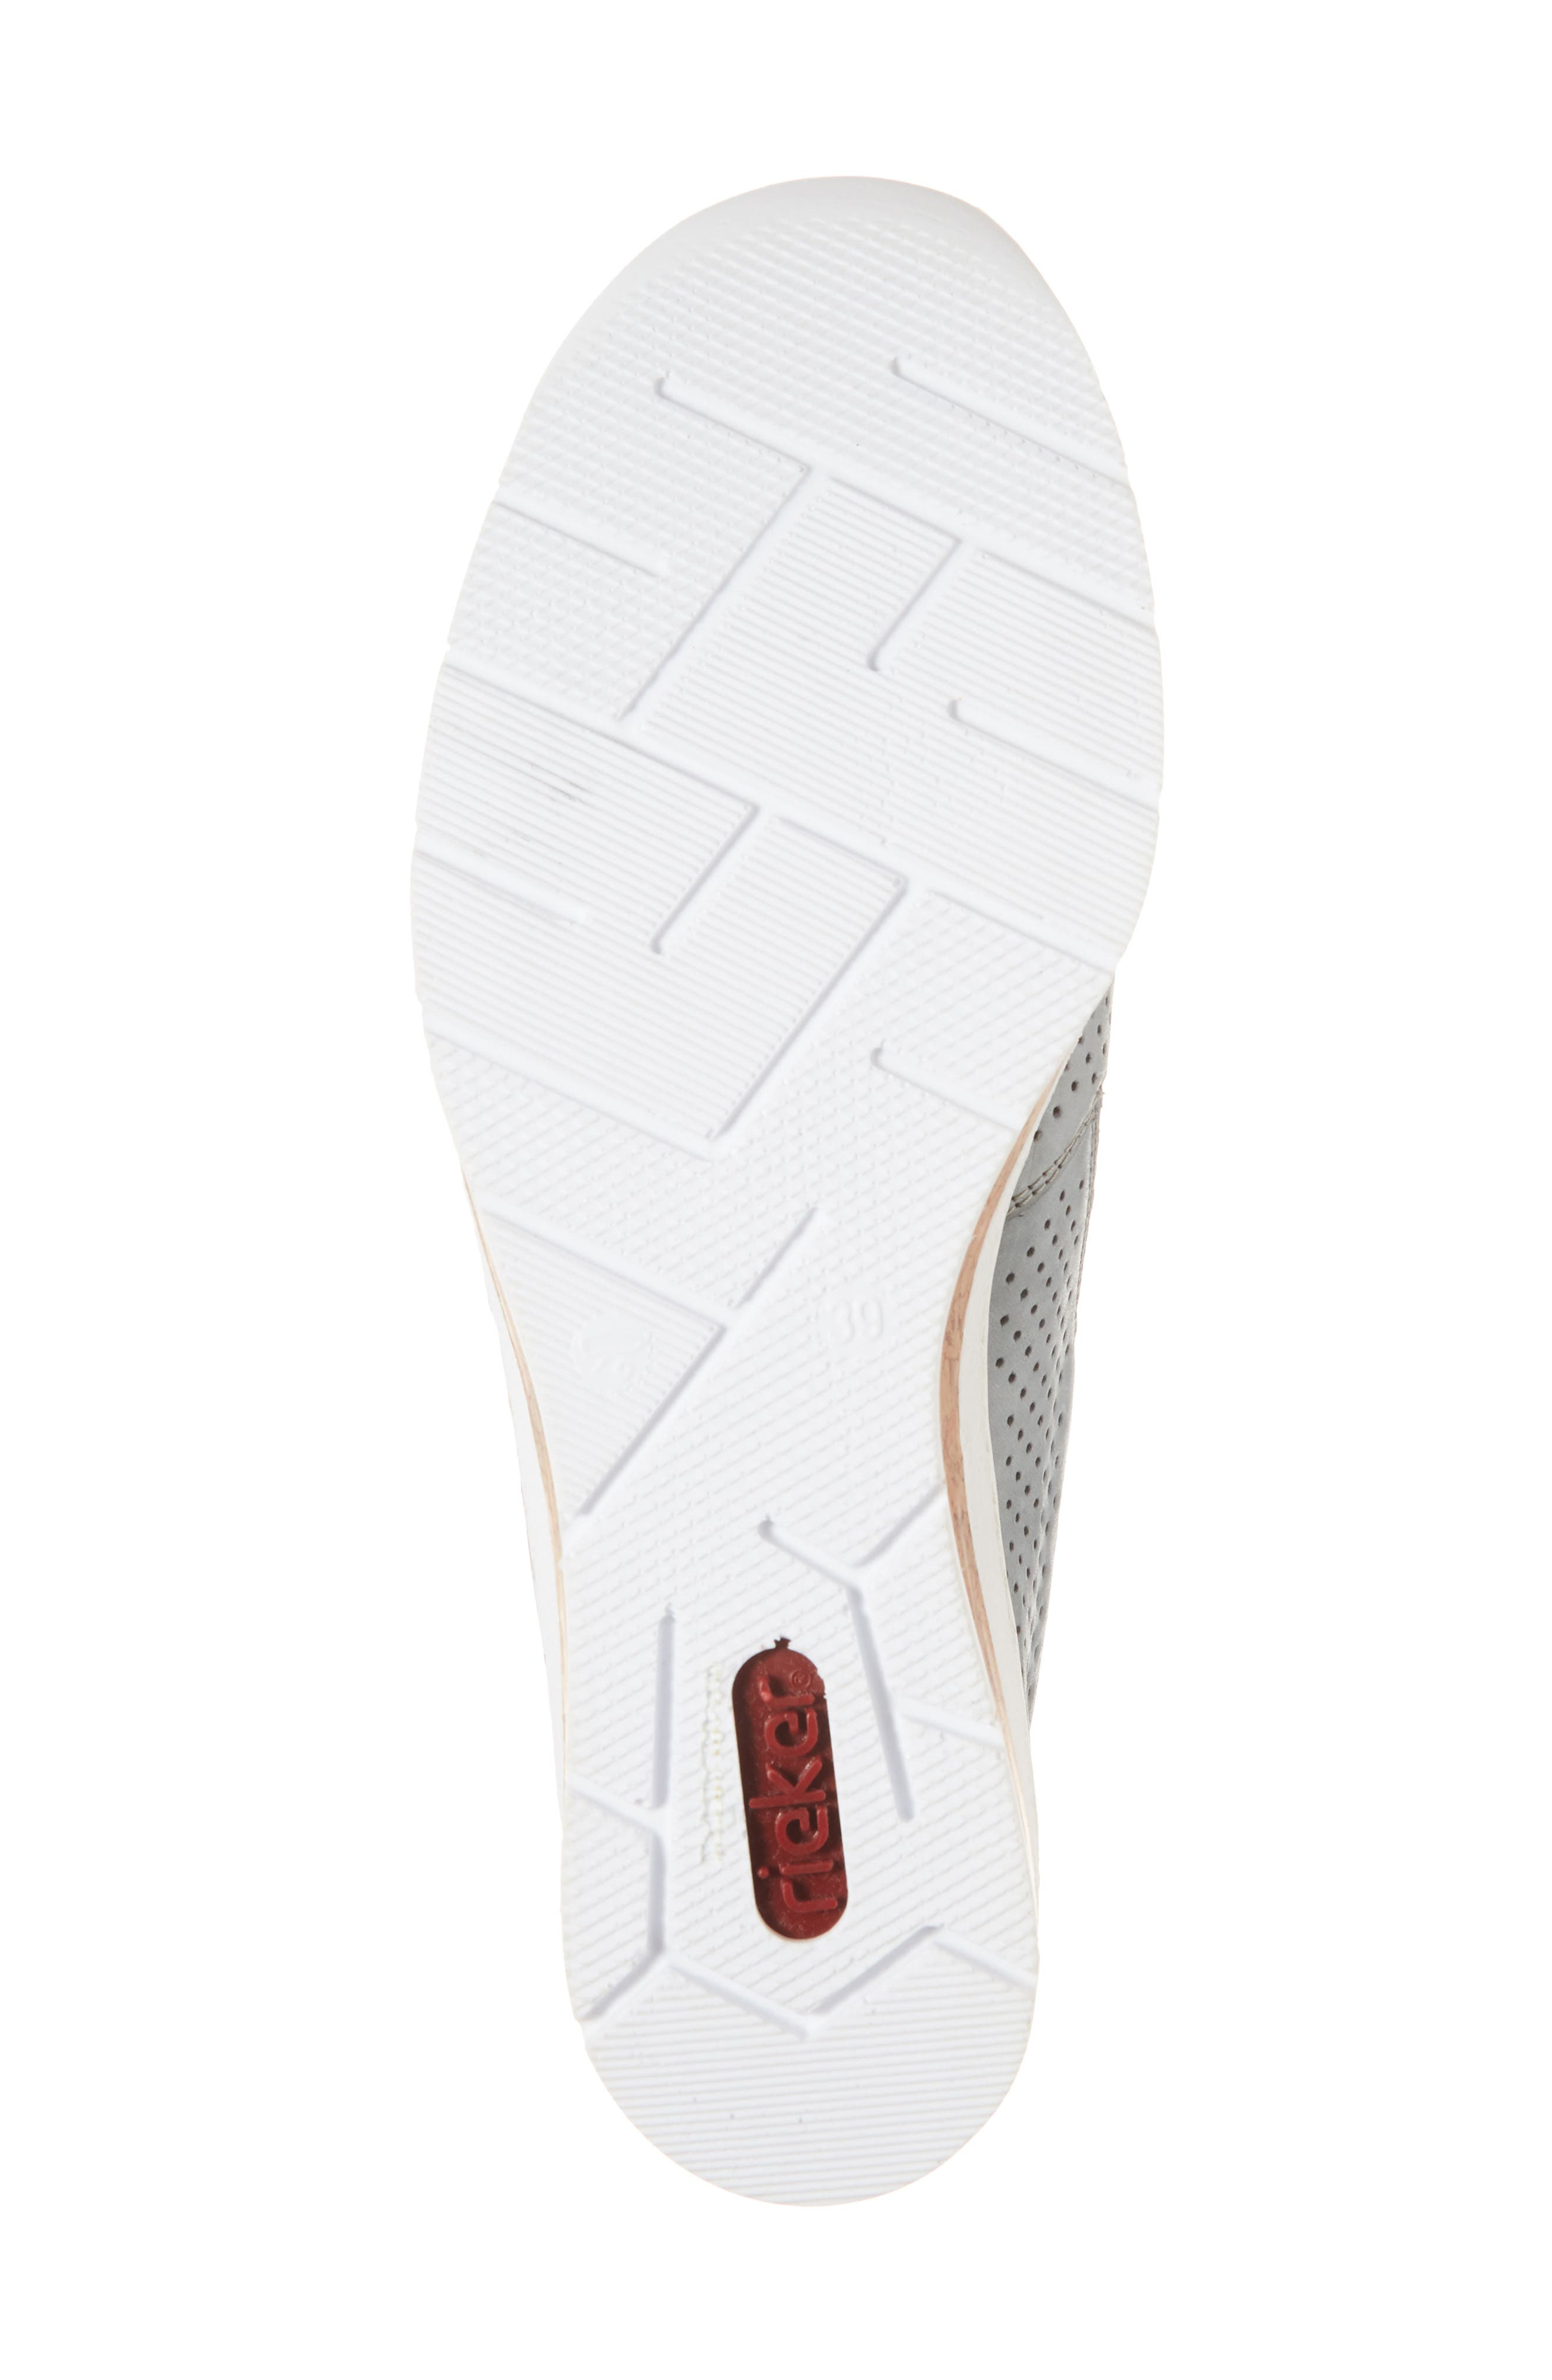 Doris 75 Wedge Sneaker,                             Alternate thumbnail 6, color,                             Royal Faux Leather